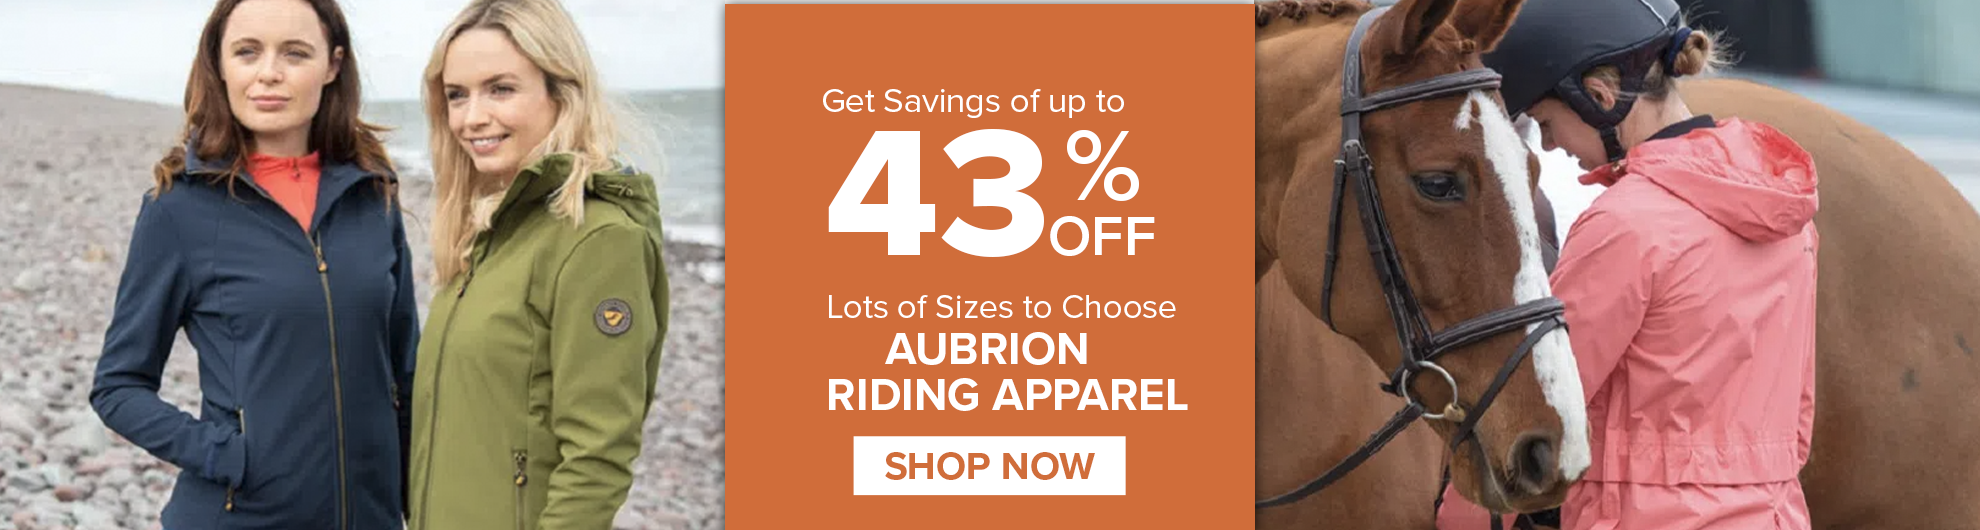 Aubrion on Sale